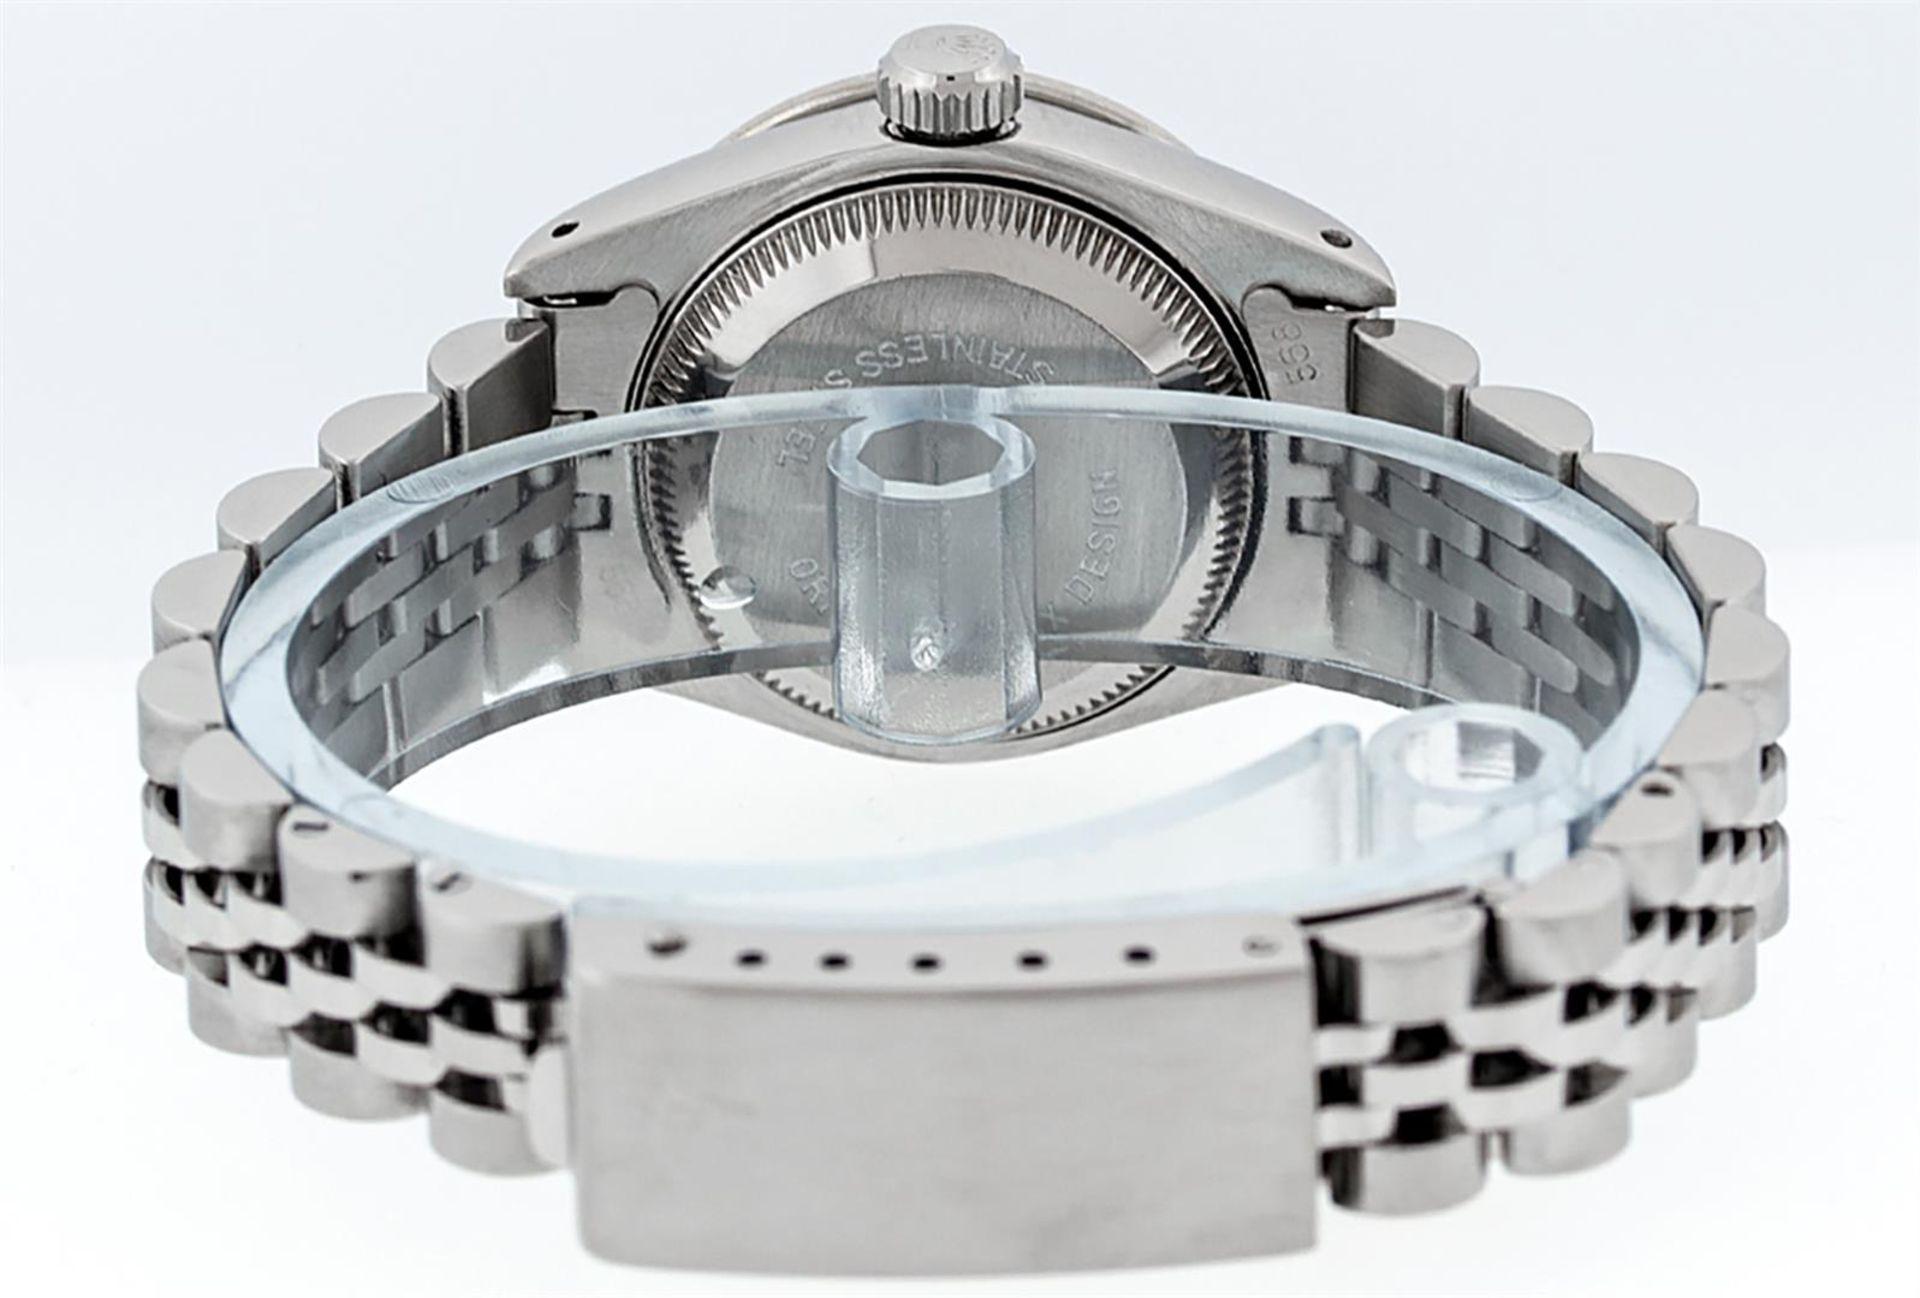 Rolex Ladies Stainless Steel 26MM Purple String Diamond Lugs Datejust Wristwatch - Image 7 of 9